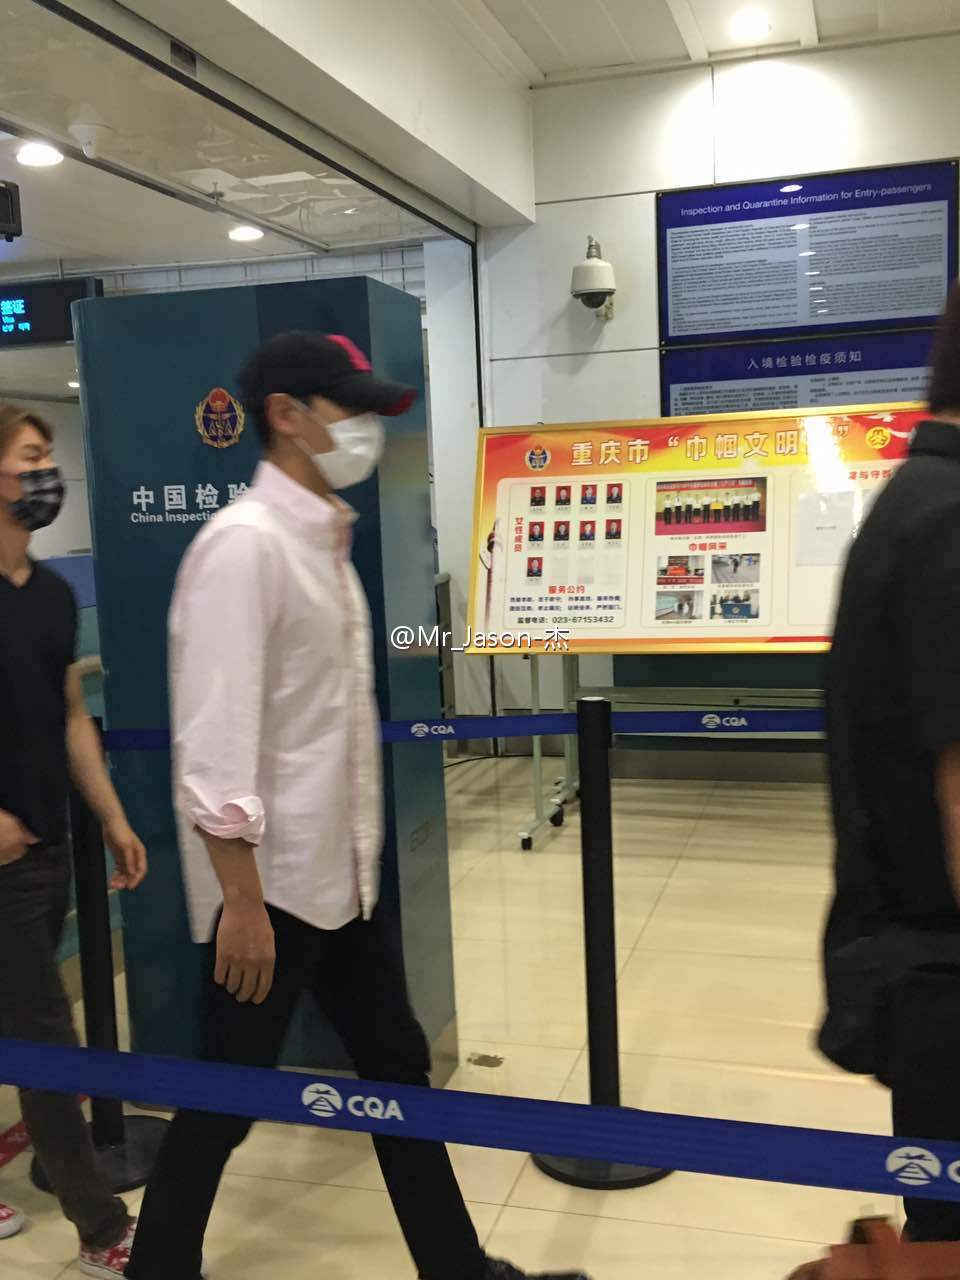 BIGBANG Arrival Chongqing 2016-06-30 (4)